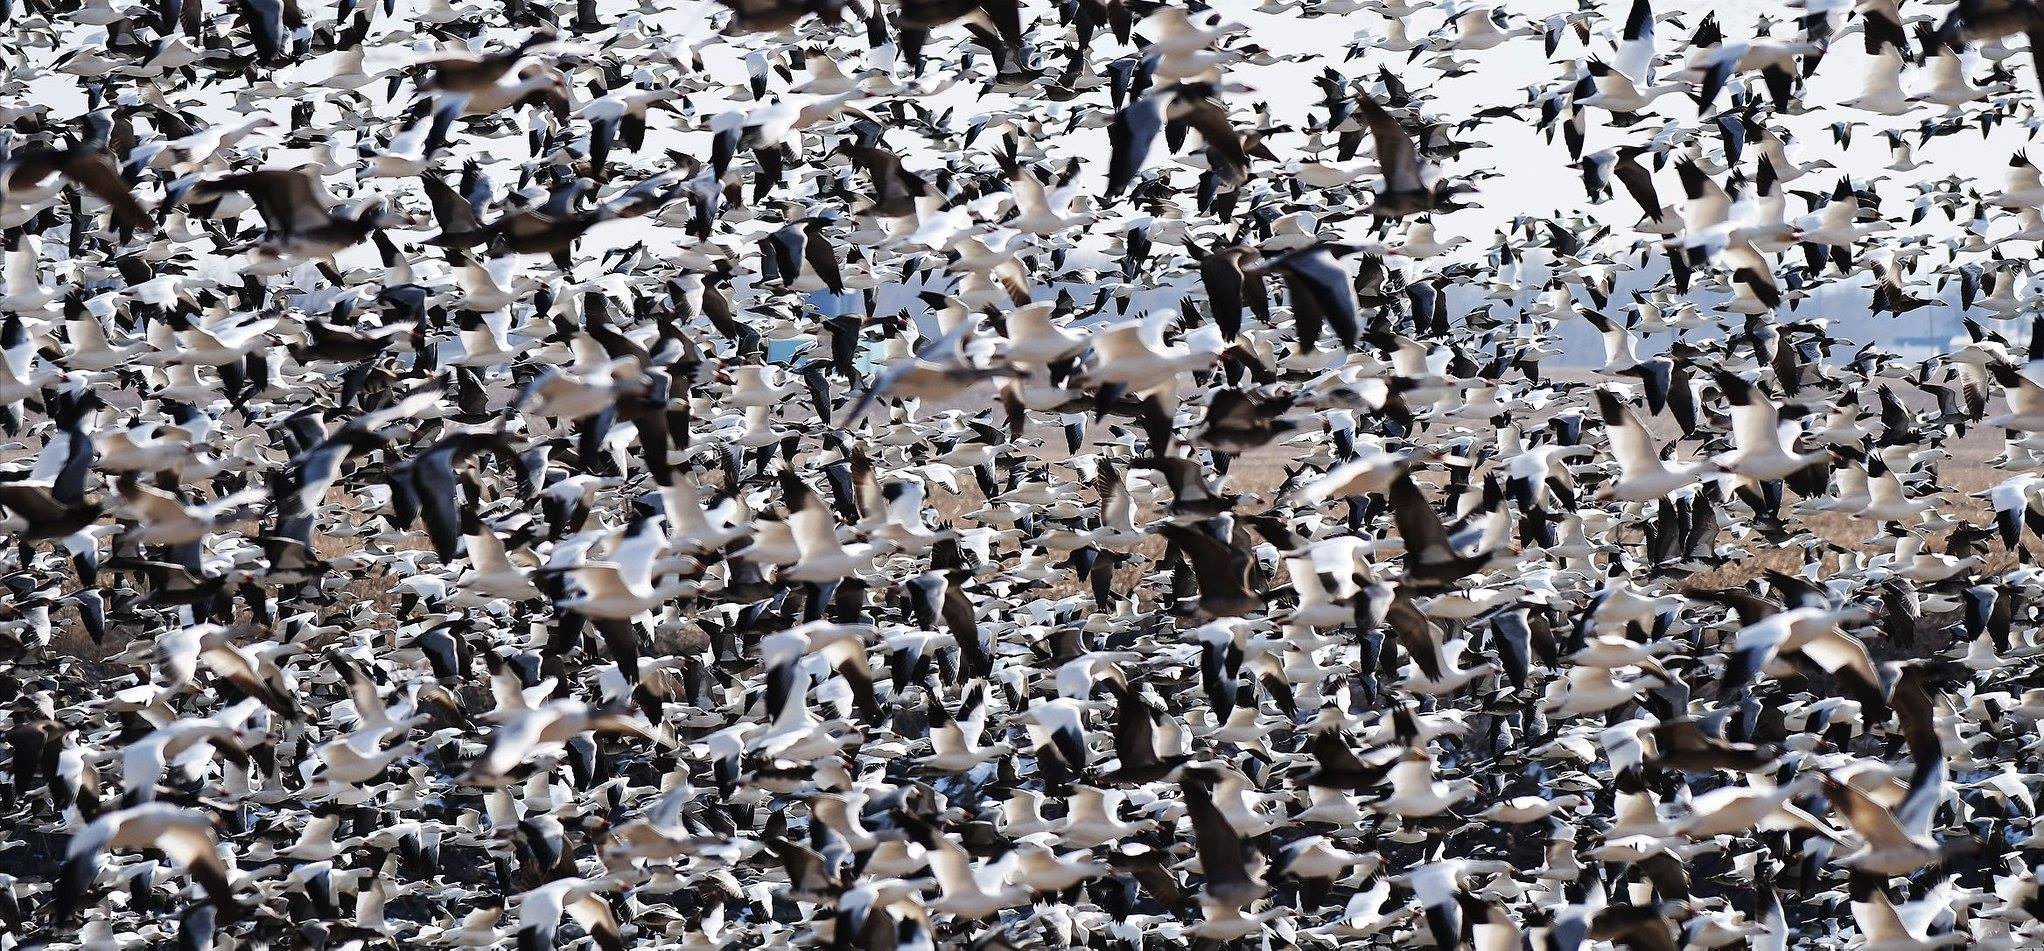 Geese Flock Flying in Dakota Dunes on Missouri River by Chadd Goosmann Aurora Photography-1.jpg